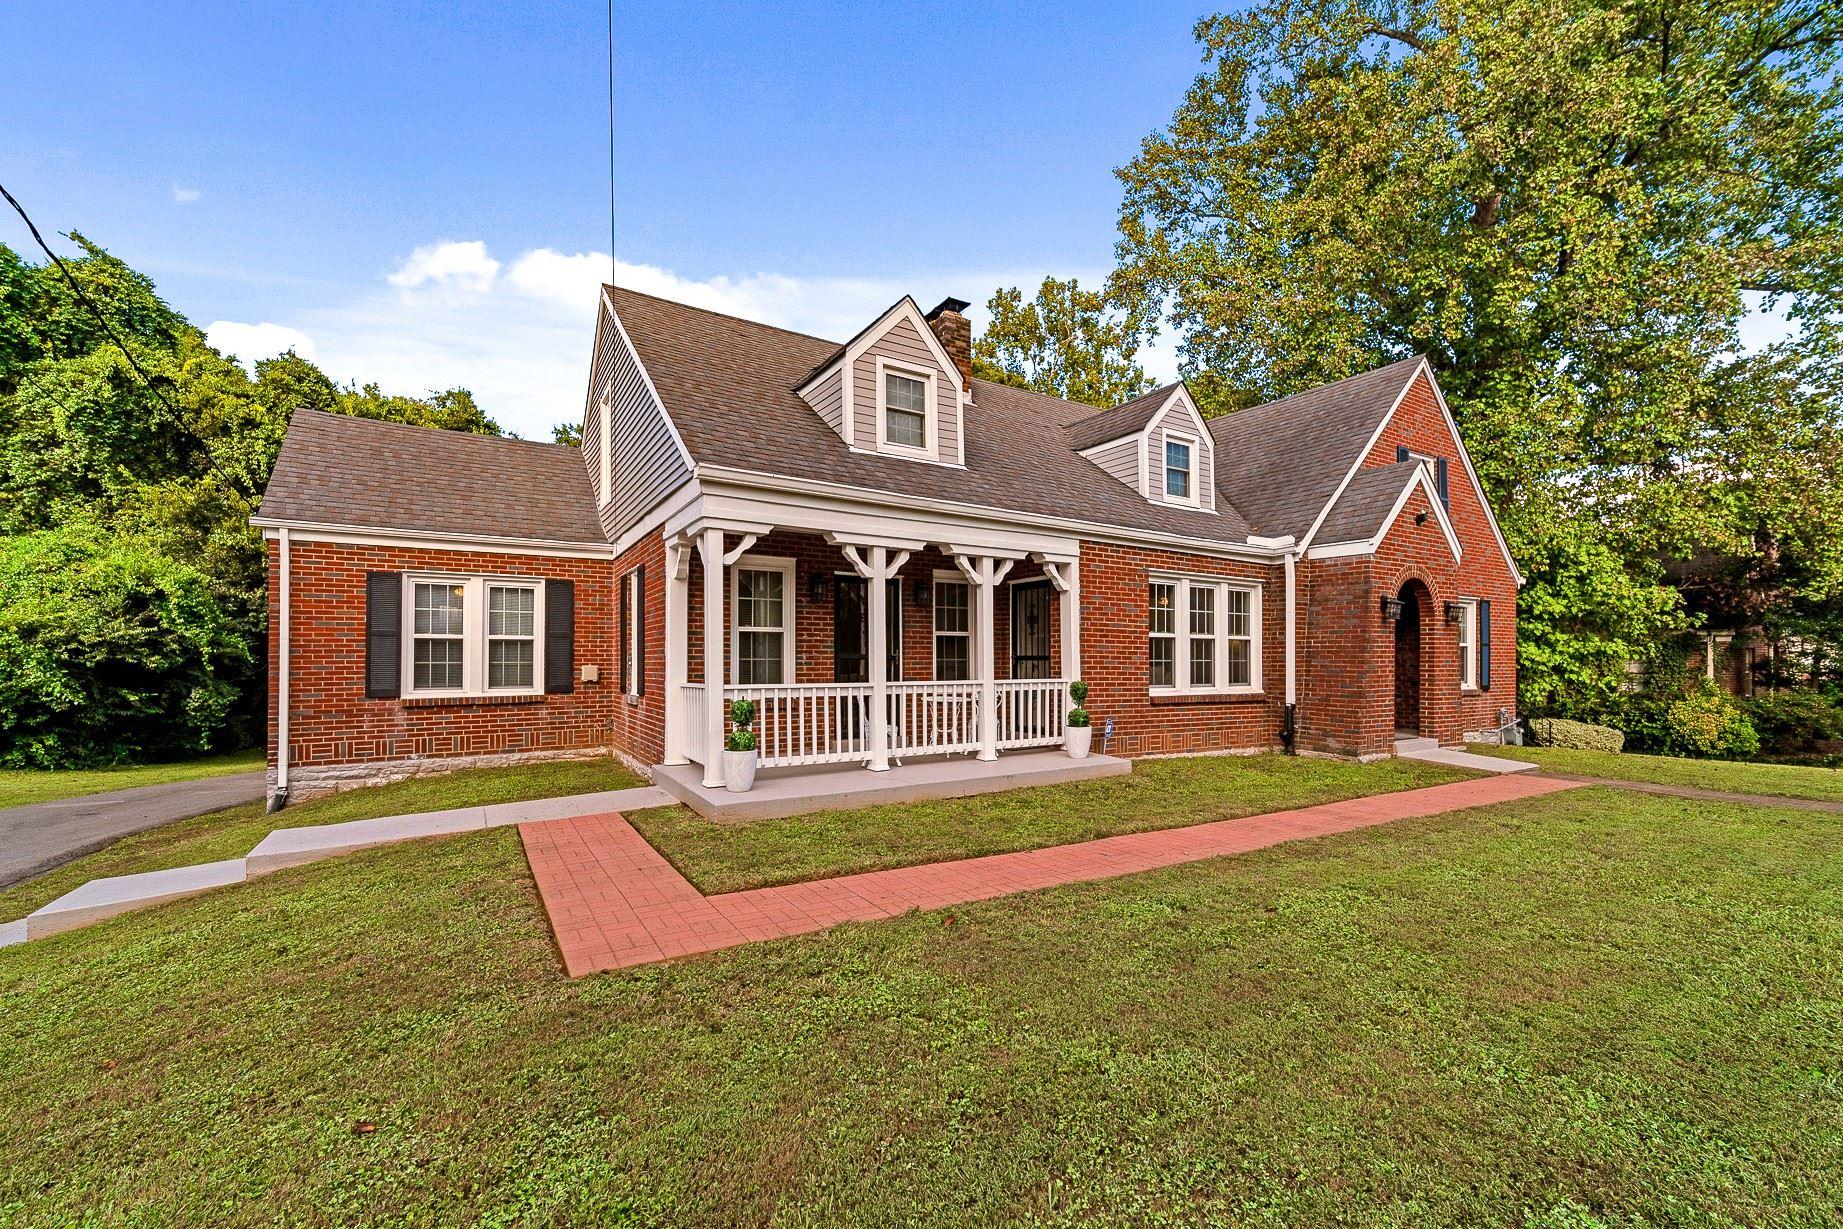 1307 Riverwood Dr, Nashville, TN 37216 - MLS#: 2290429